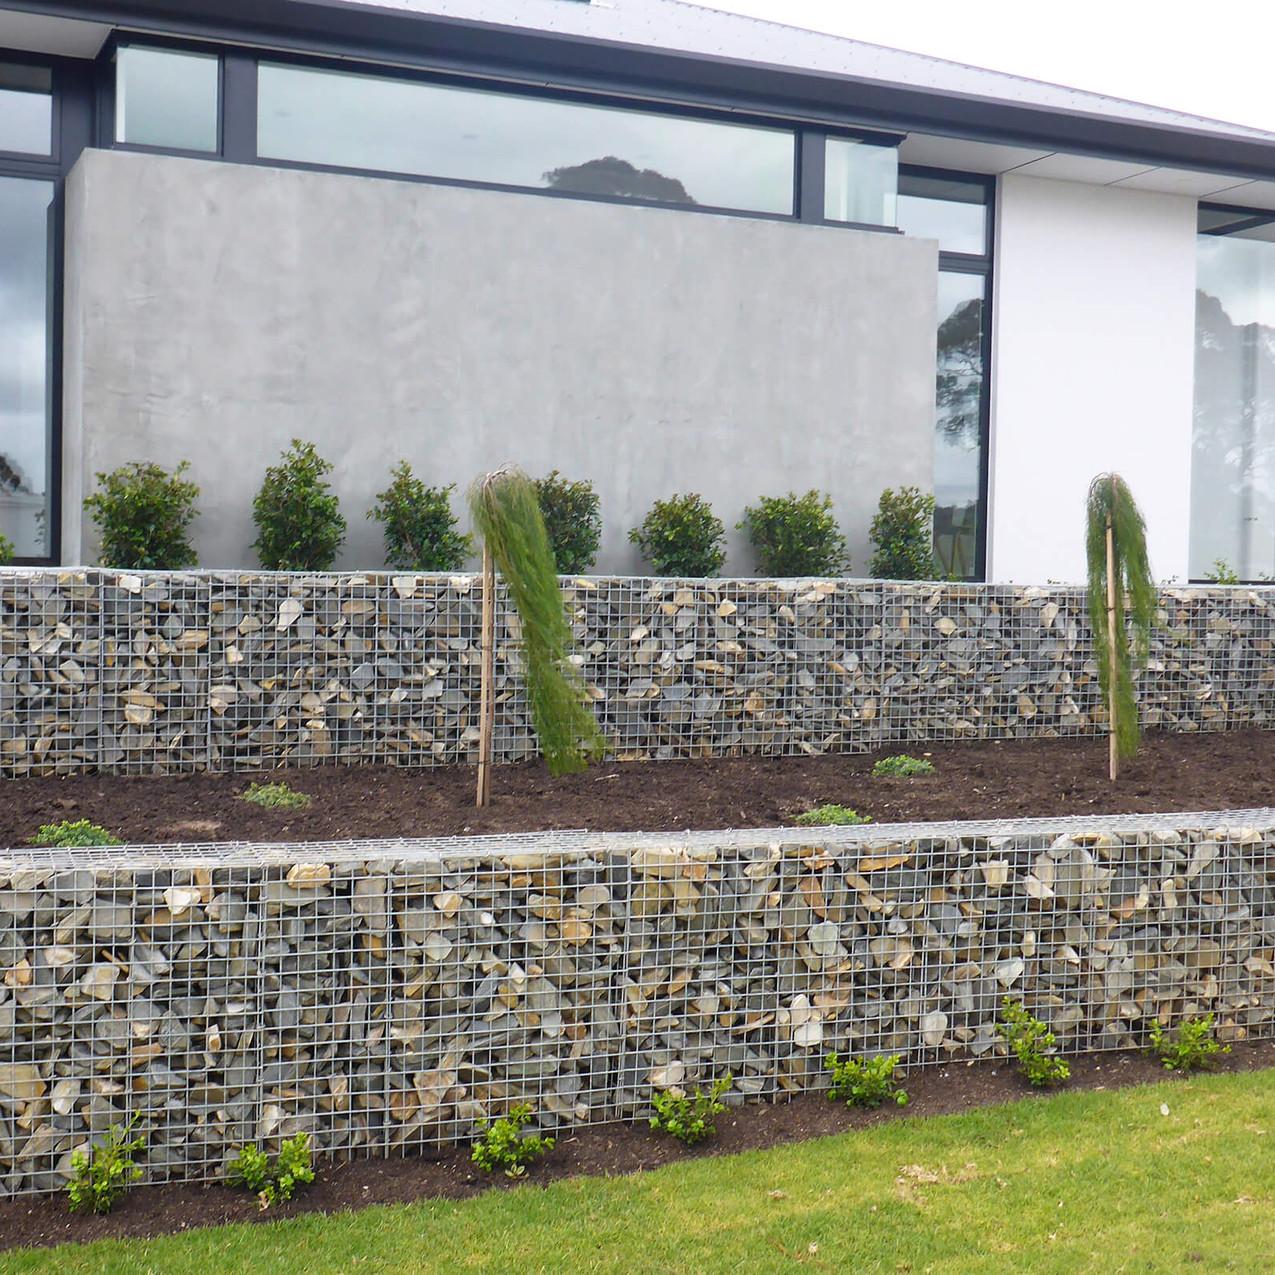 Rockweld Walls and Garden Bed